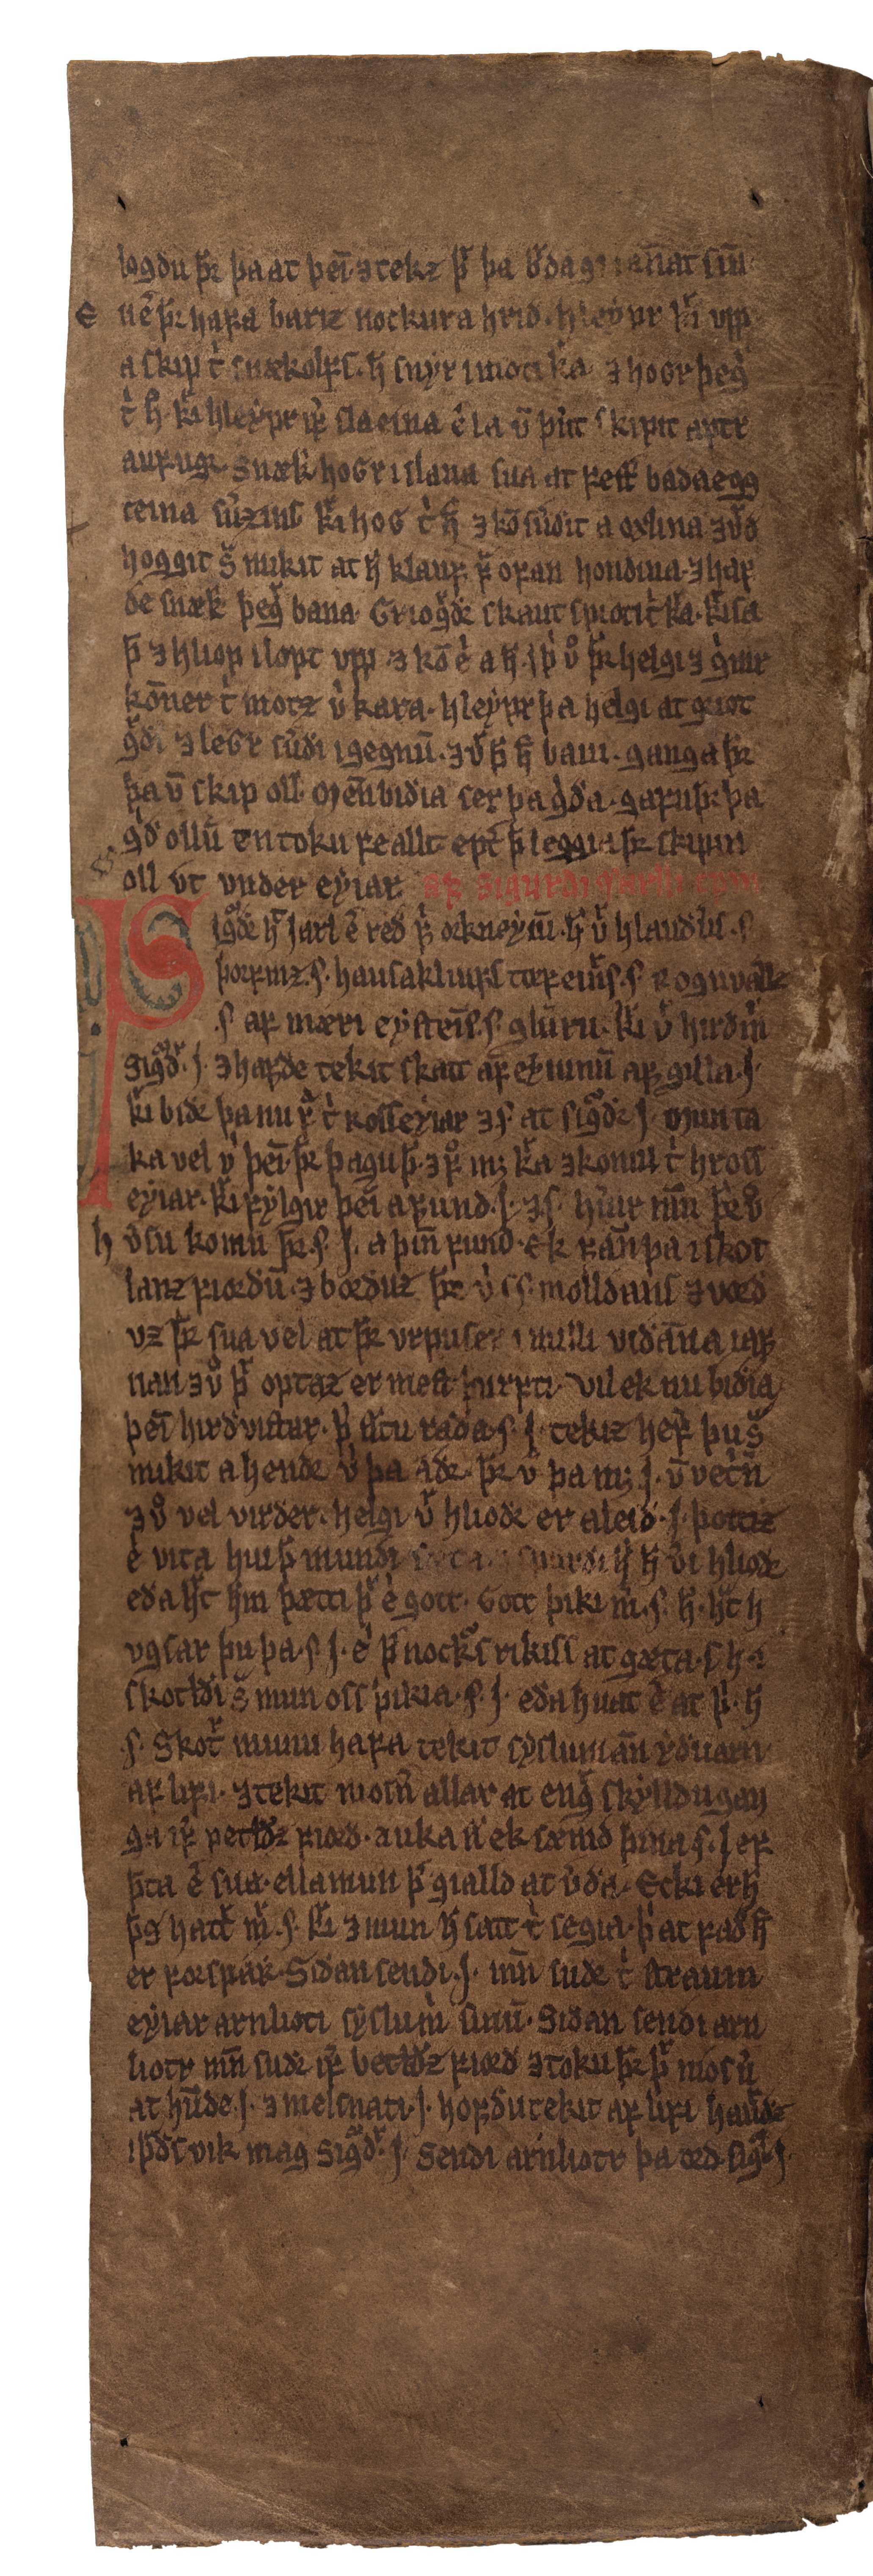 AM 132 fol - 29v